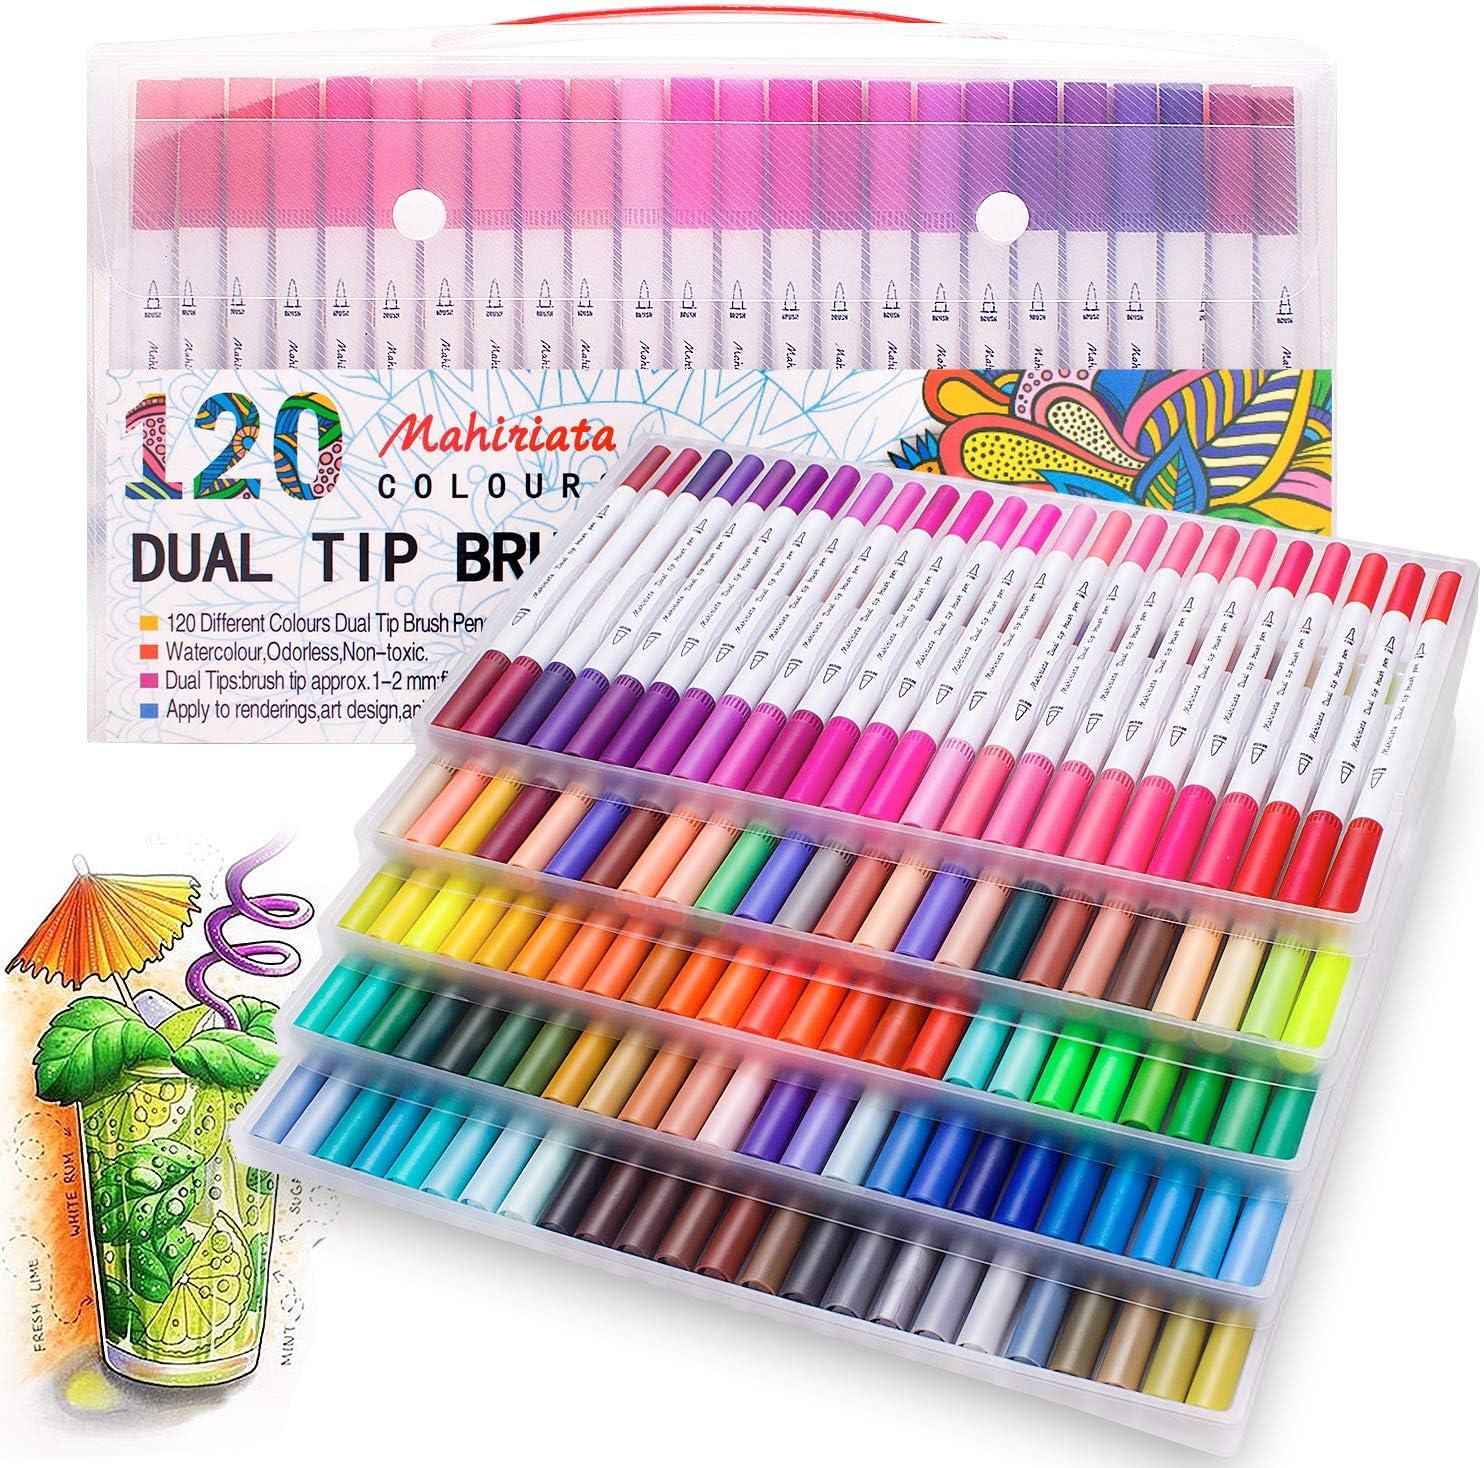 Lots 10 Colour Brush Pen Marker Pen Watercolour Drawing Painting Sketch Artist